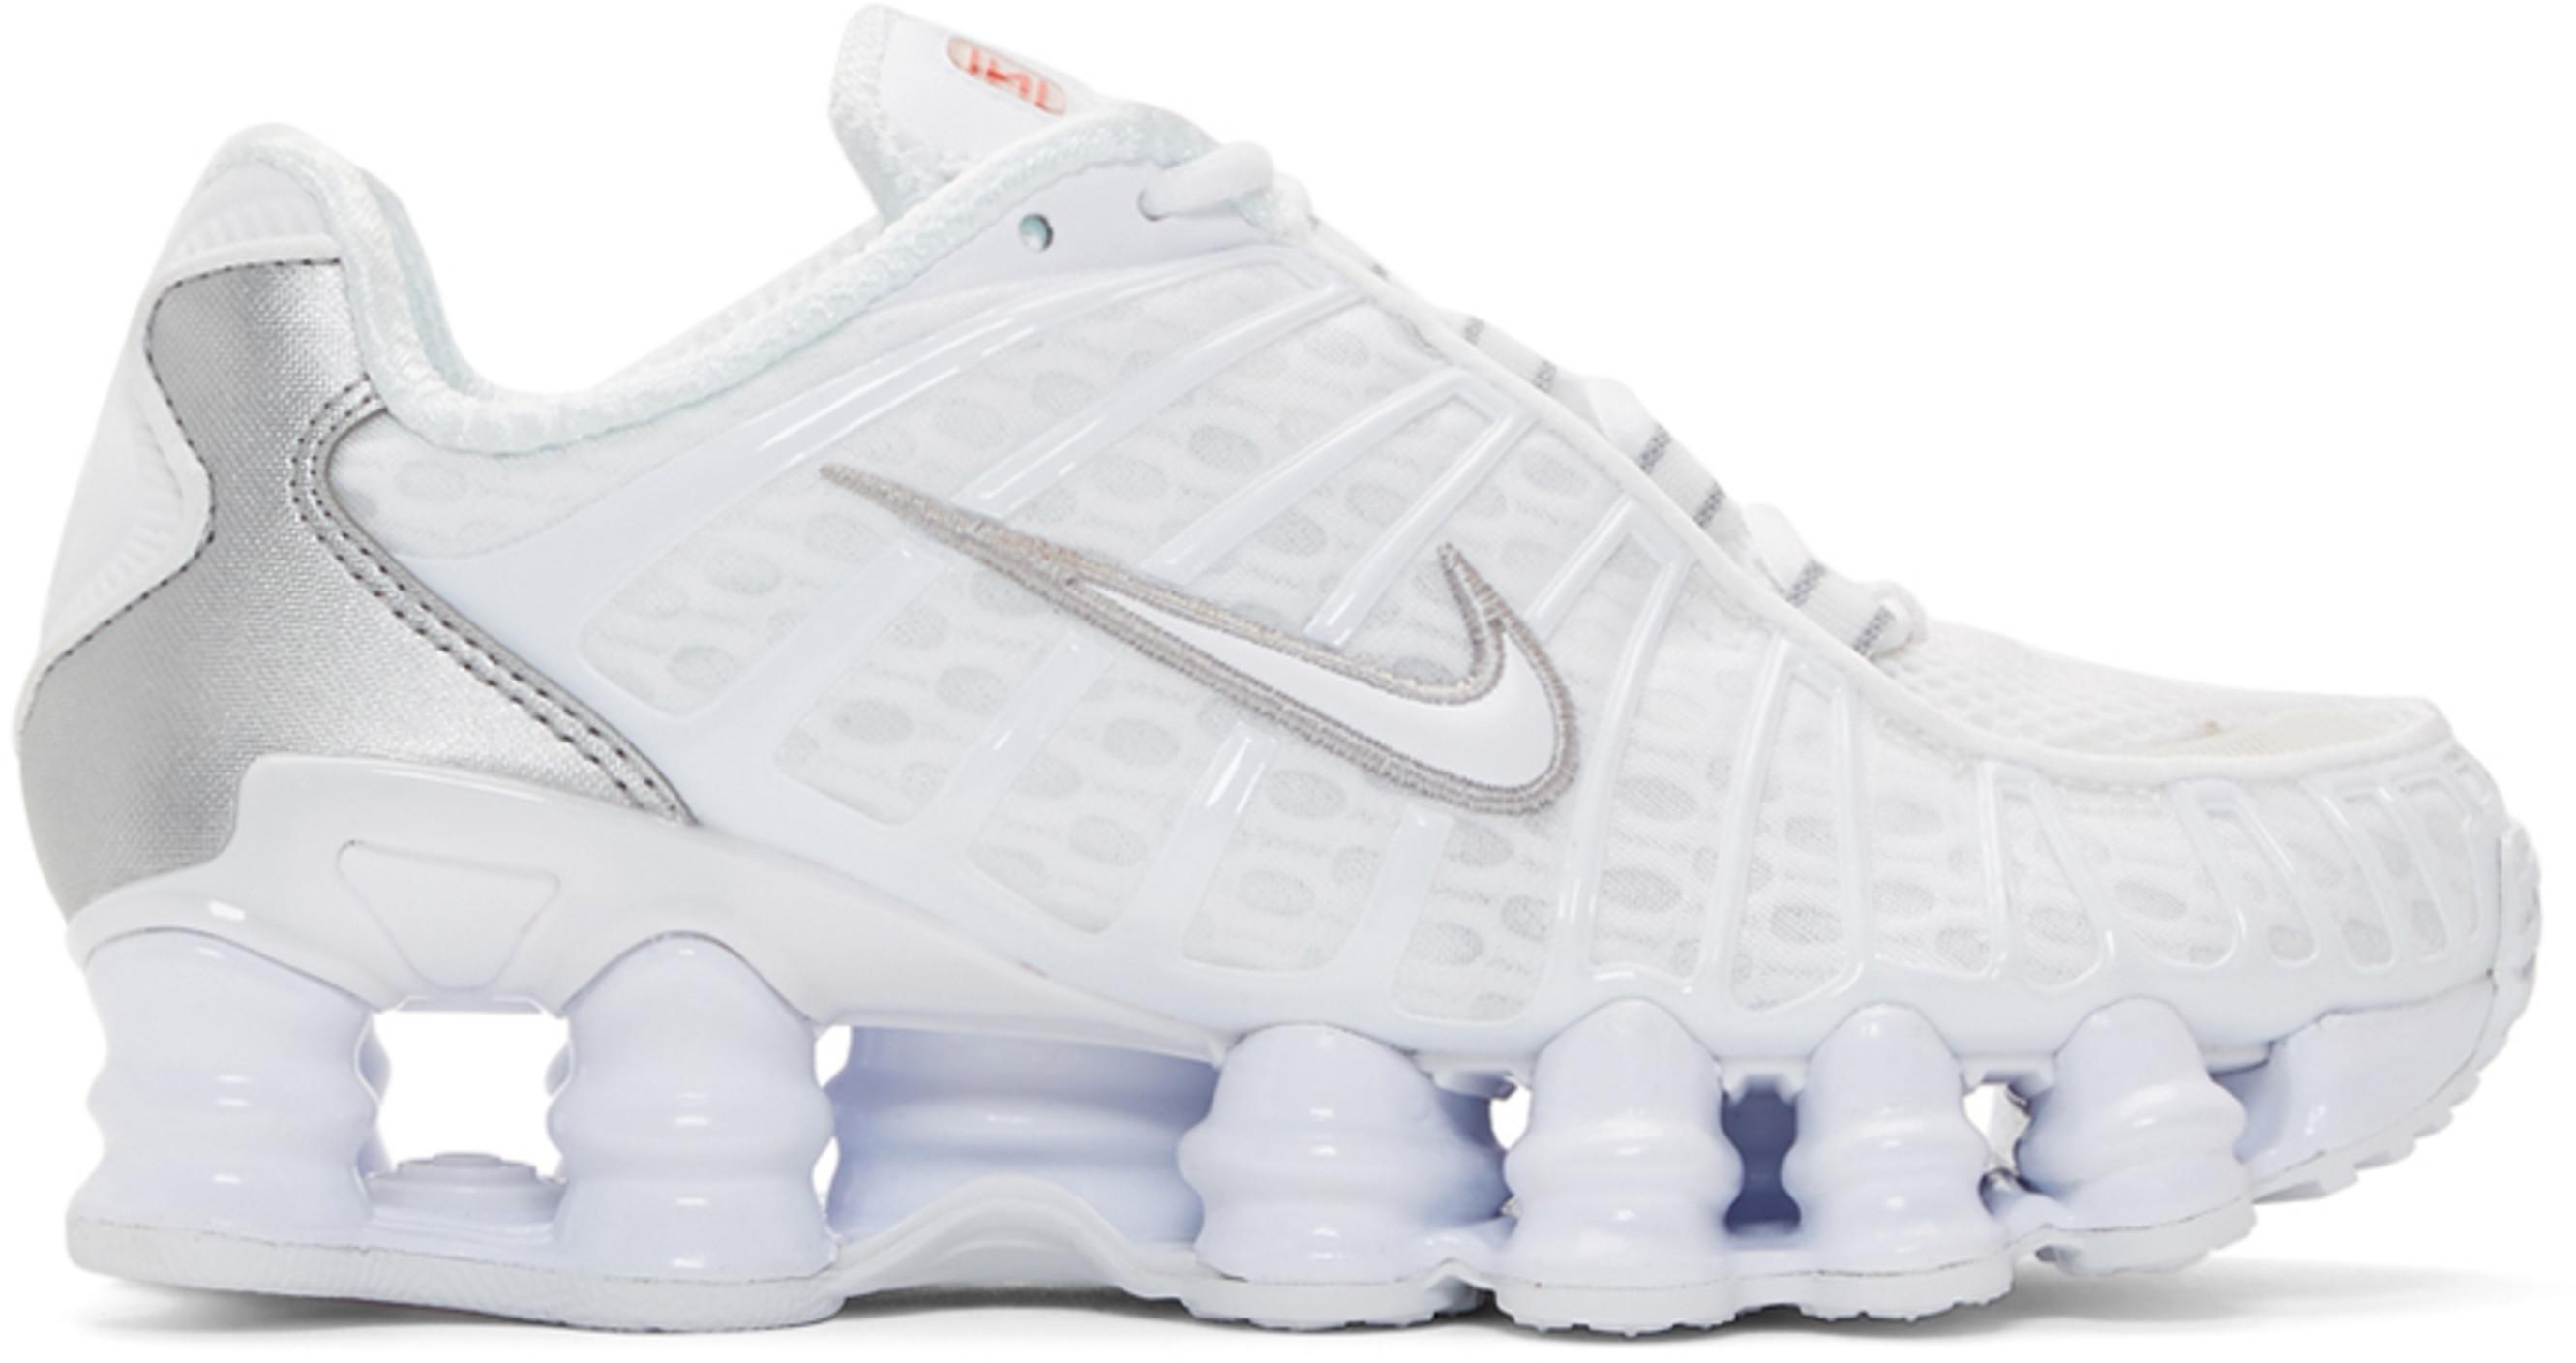 31c2e71b49 Nike for Women FW19 Collection   SSENSE